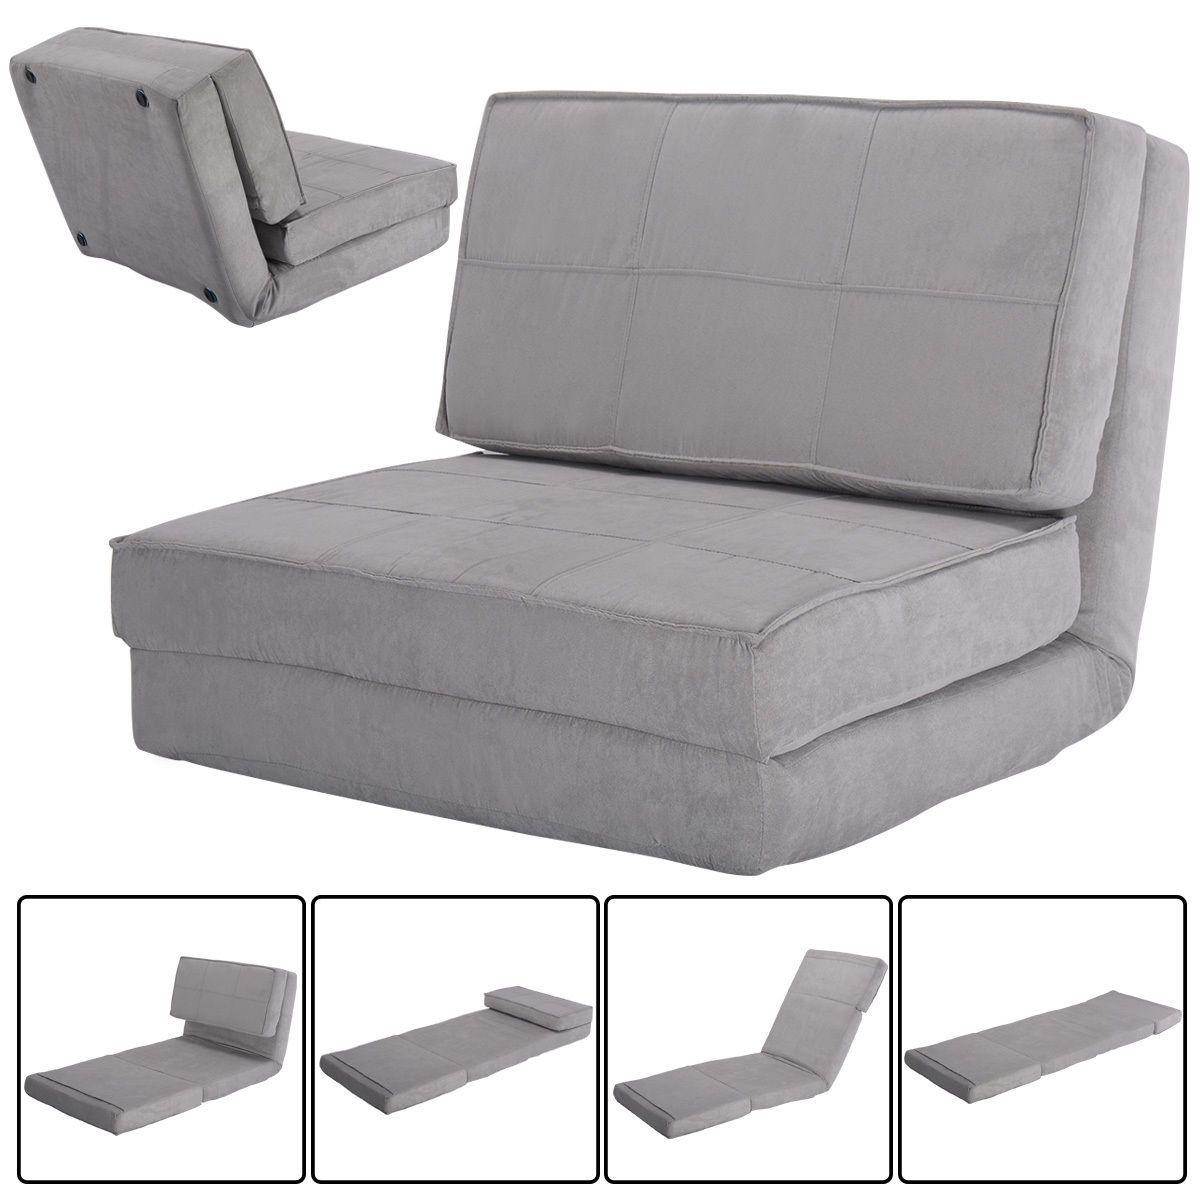 Convertible Lounger Folding Sofa Sleeper Bed   Furniture ...